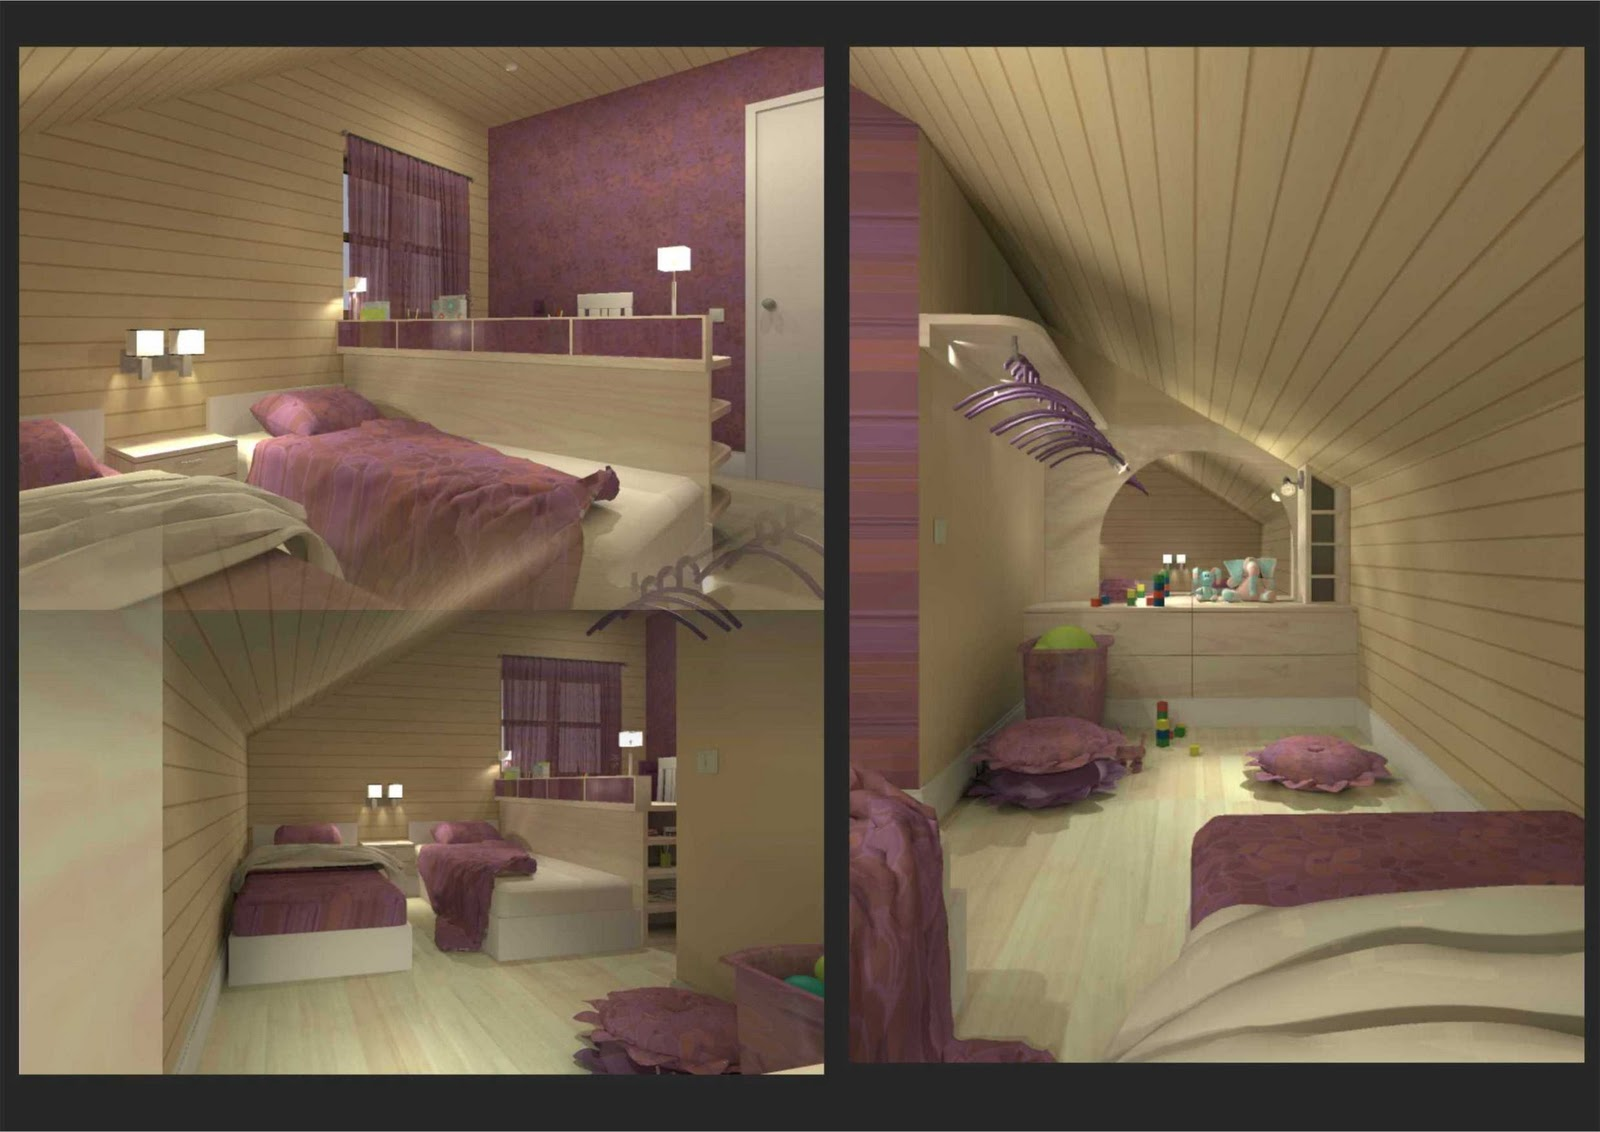 girls room ideas wallpress 1080p hd desktop. Black Bedroom Furniture Sets. Home Design Ideas